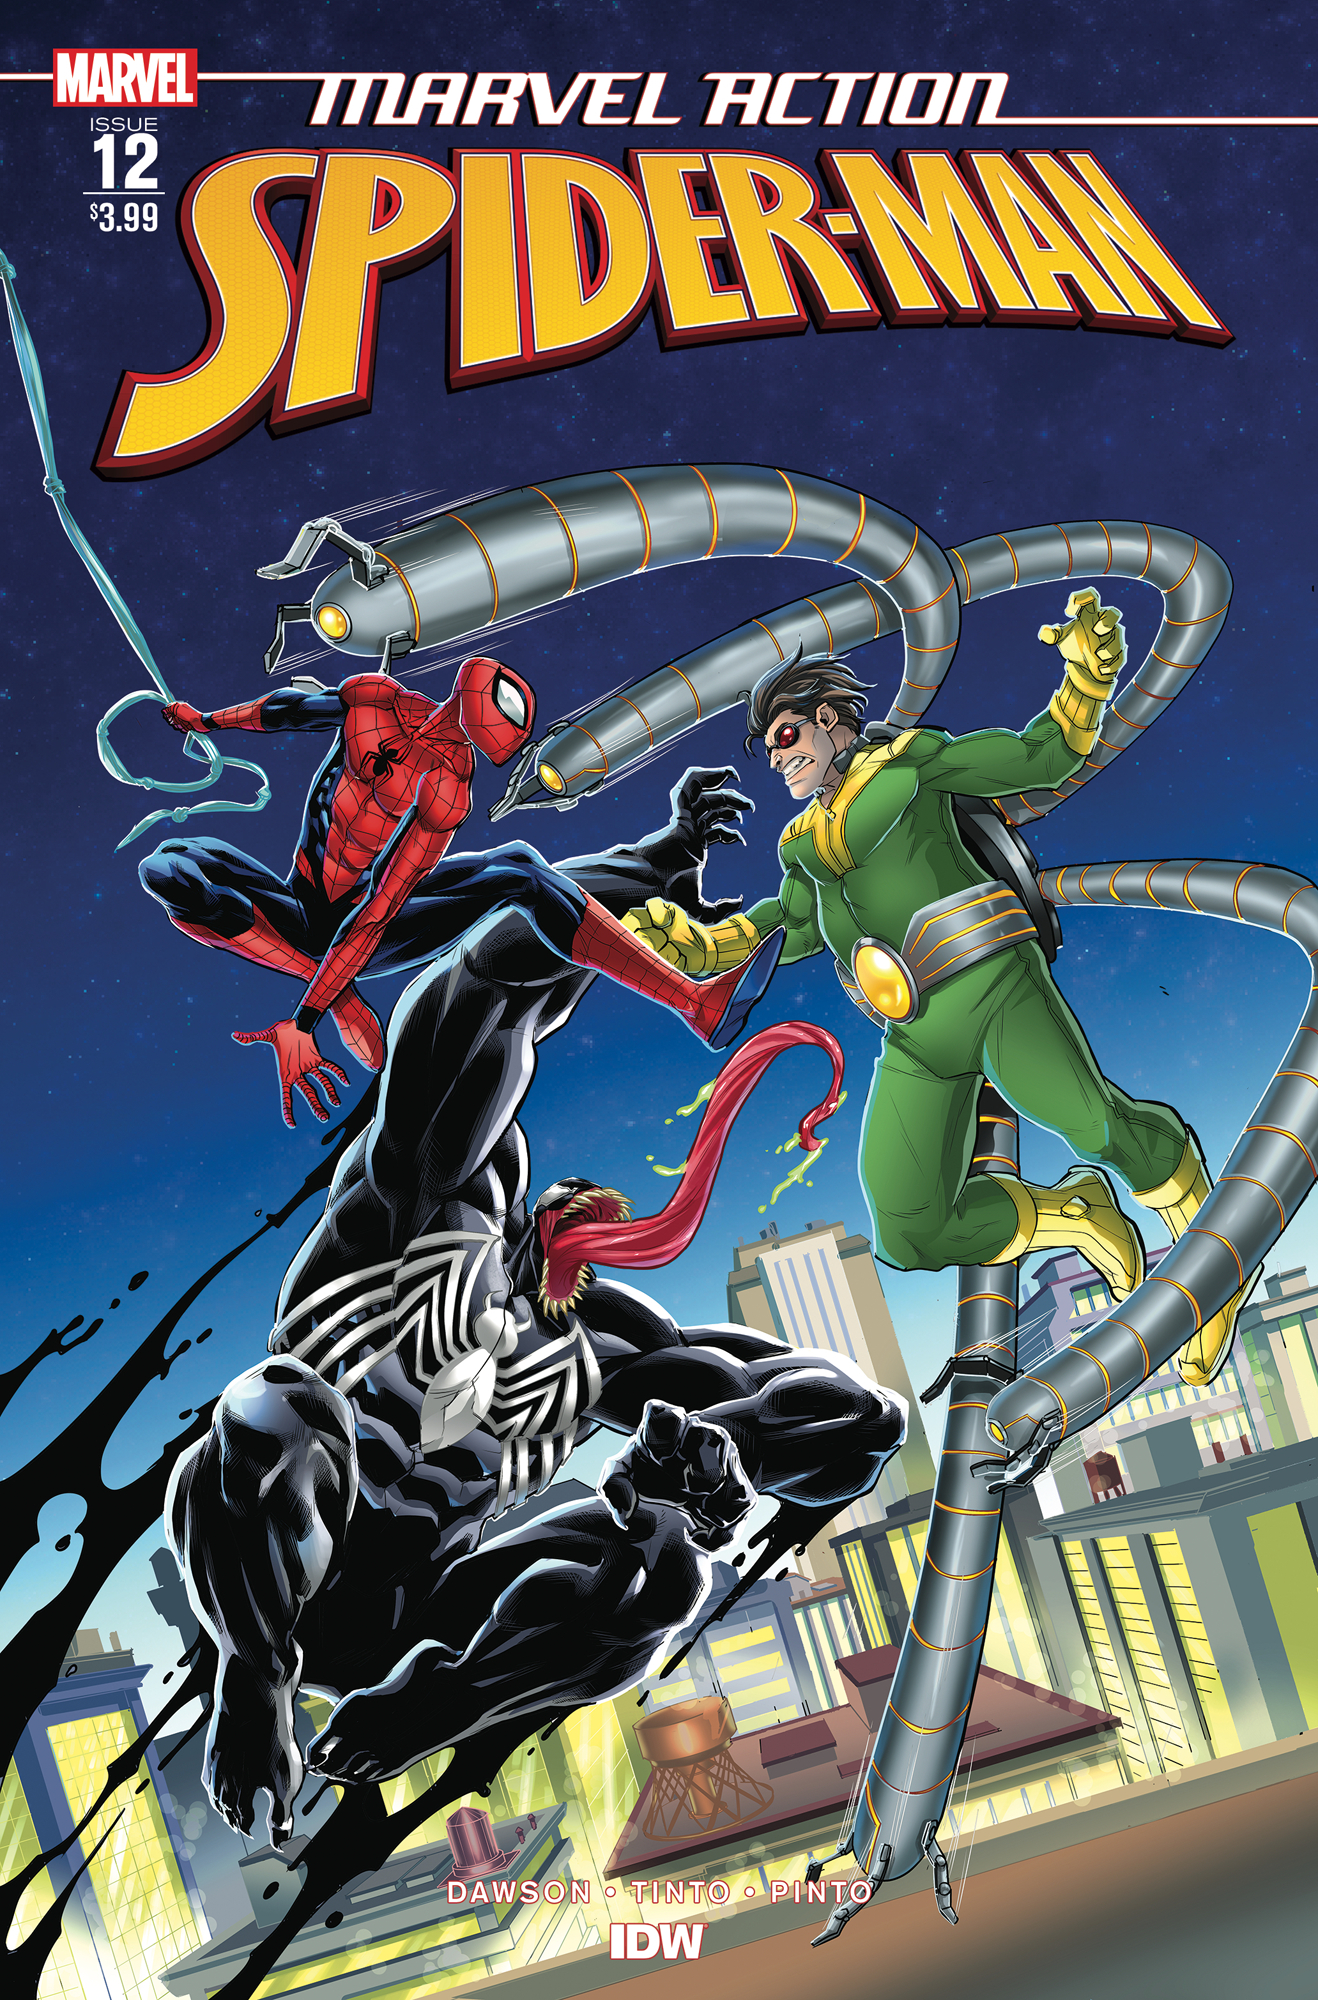 Marvel Action: Spider-Man Vol 1 12